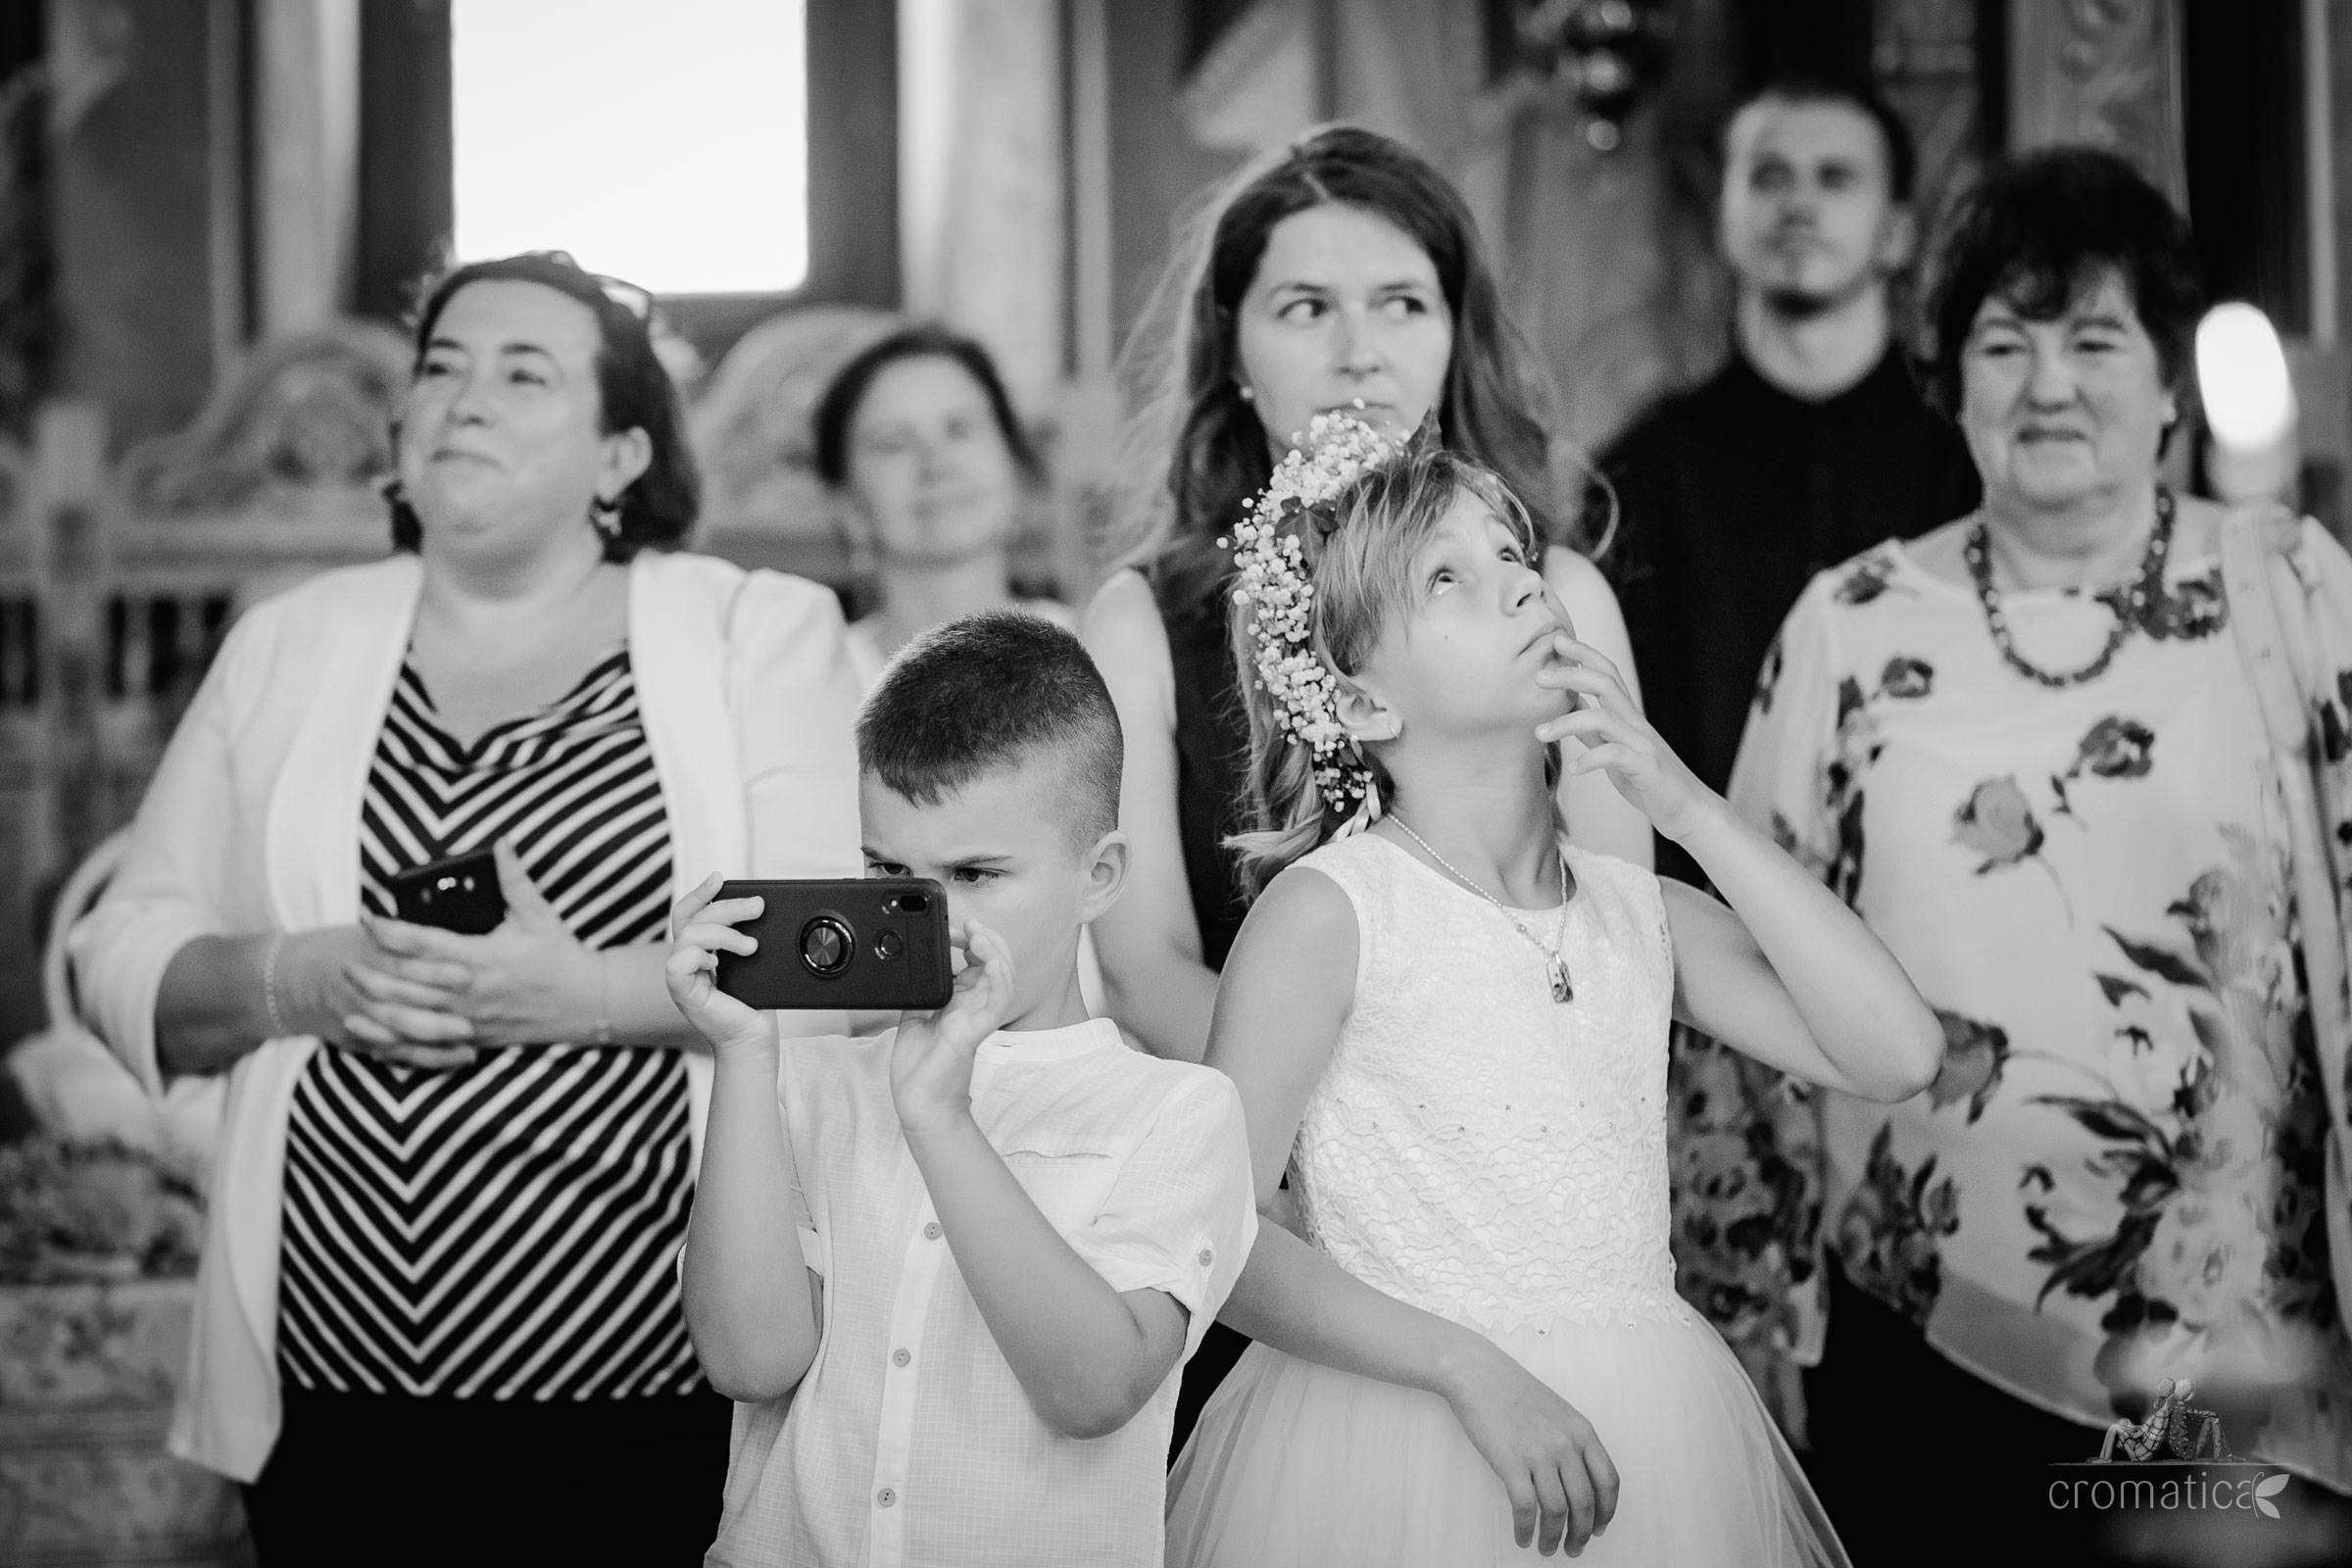 giorgiana constantin fotografii nunta delta royal delta dunarii 036